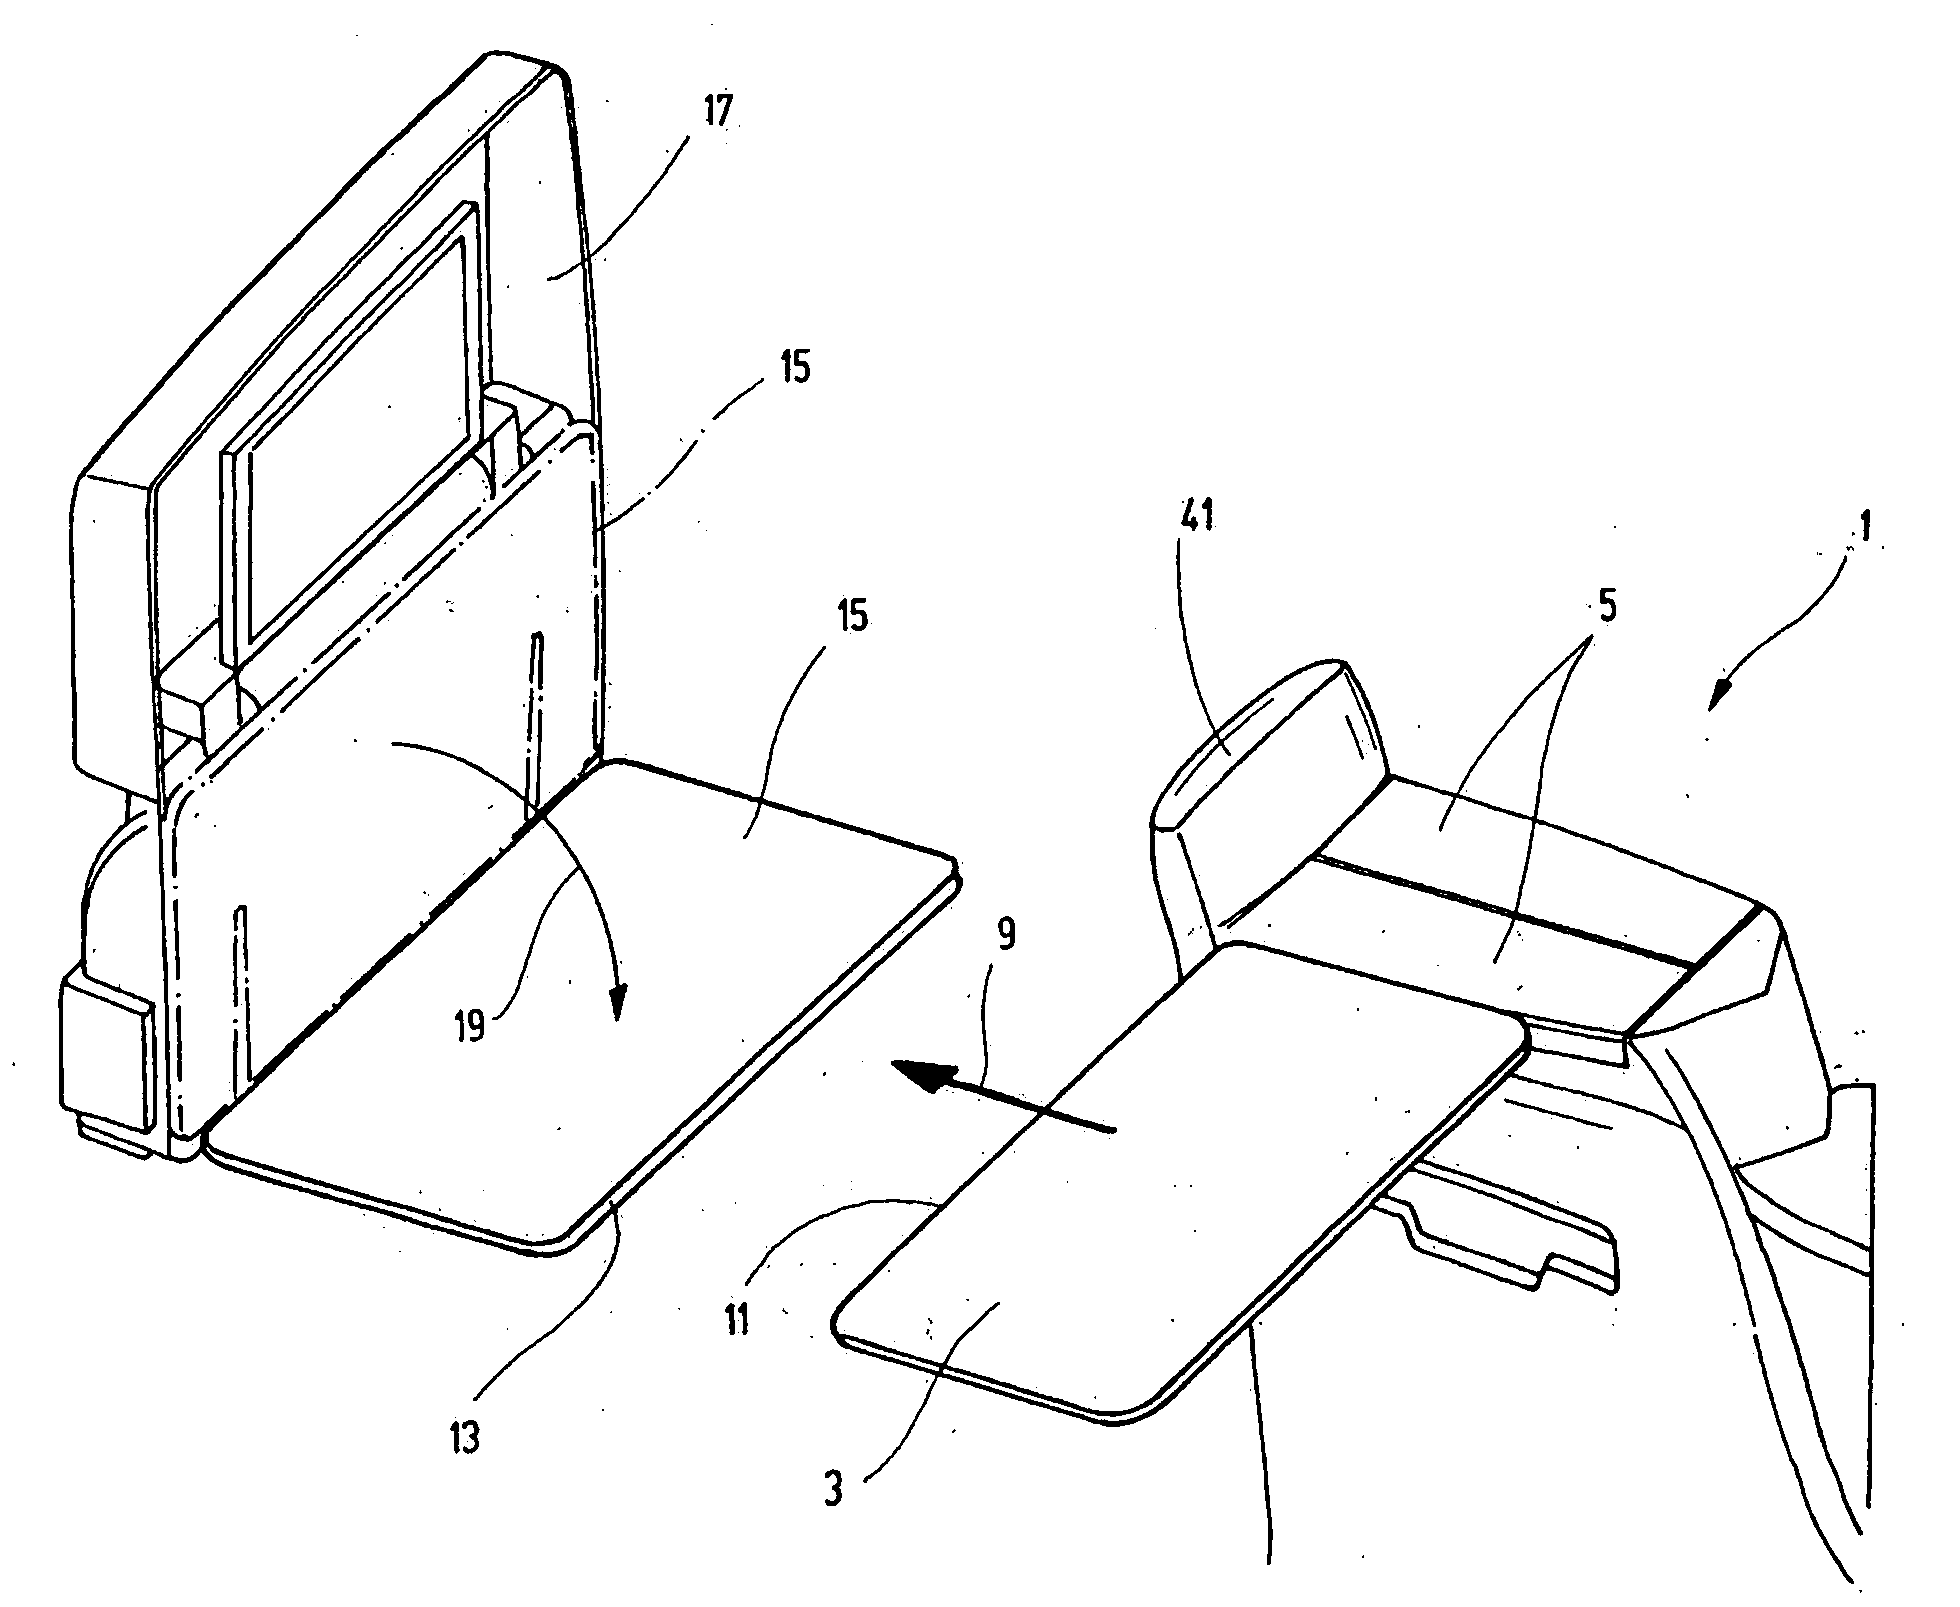 Airplane Seats Down Tray Diagram Engine Auto Parts